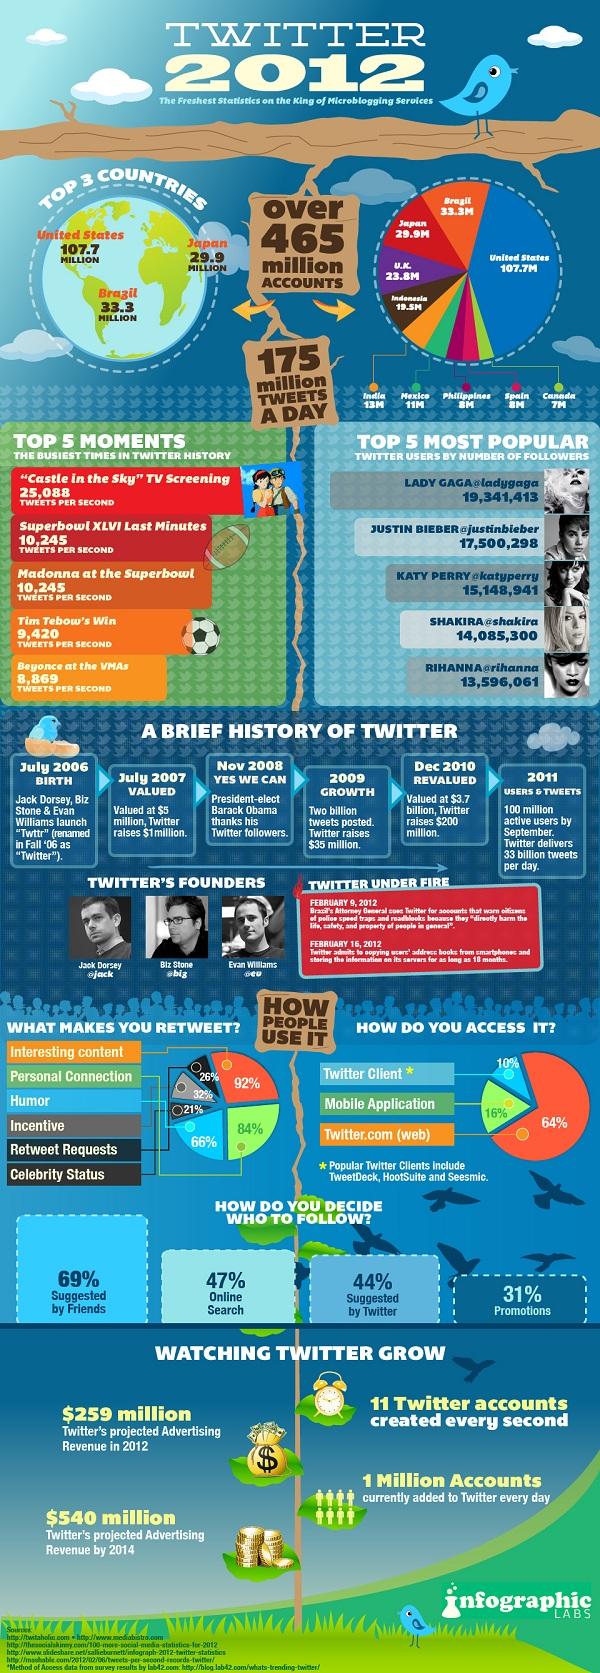 Statistiques de Twitter en 2012